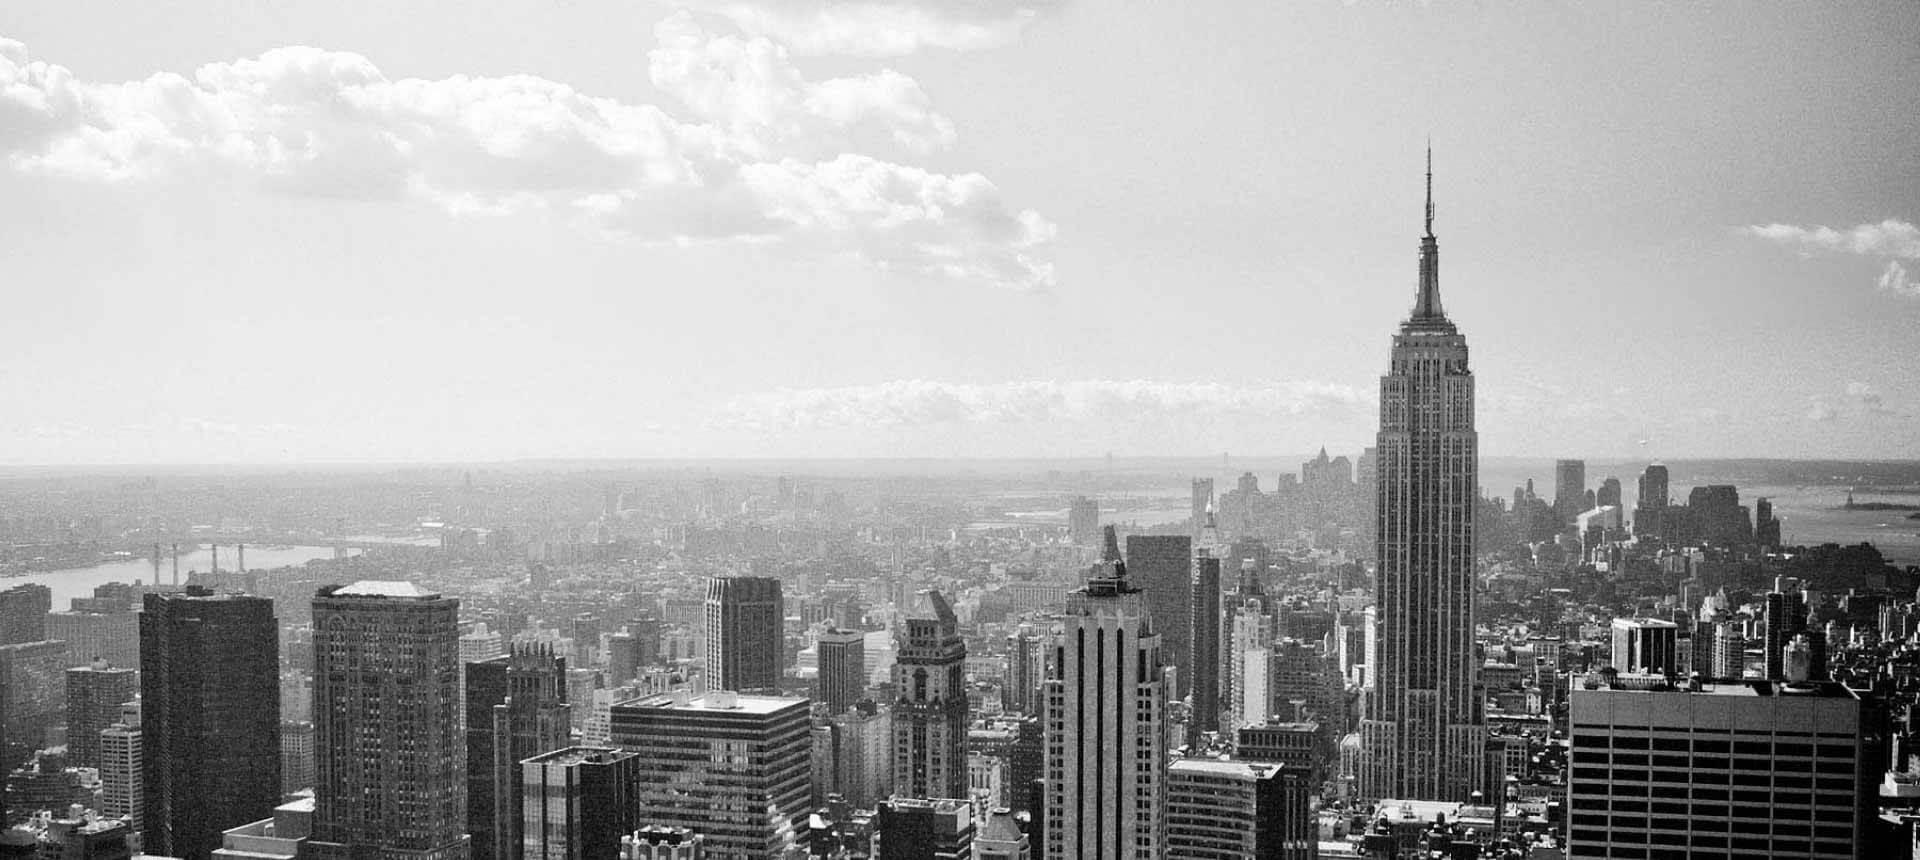 newyorkbg-860